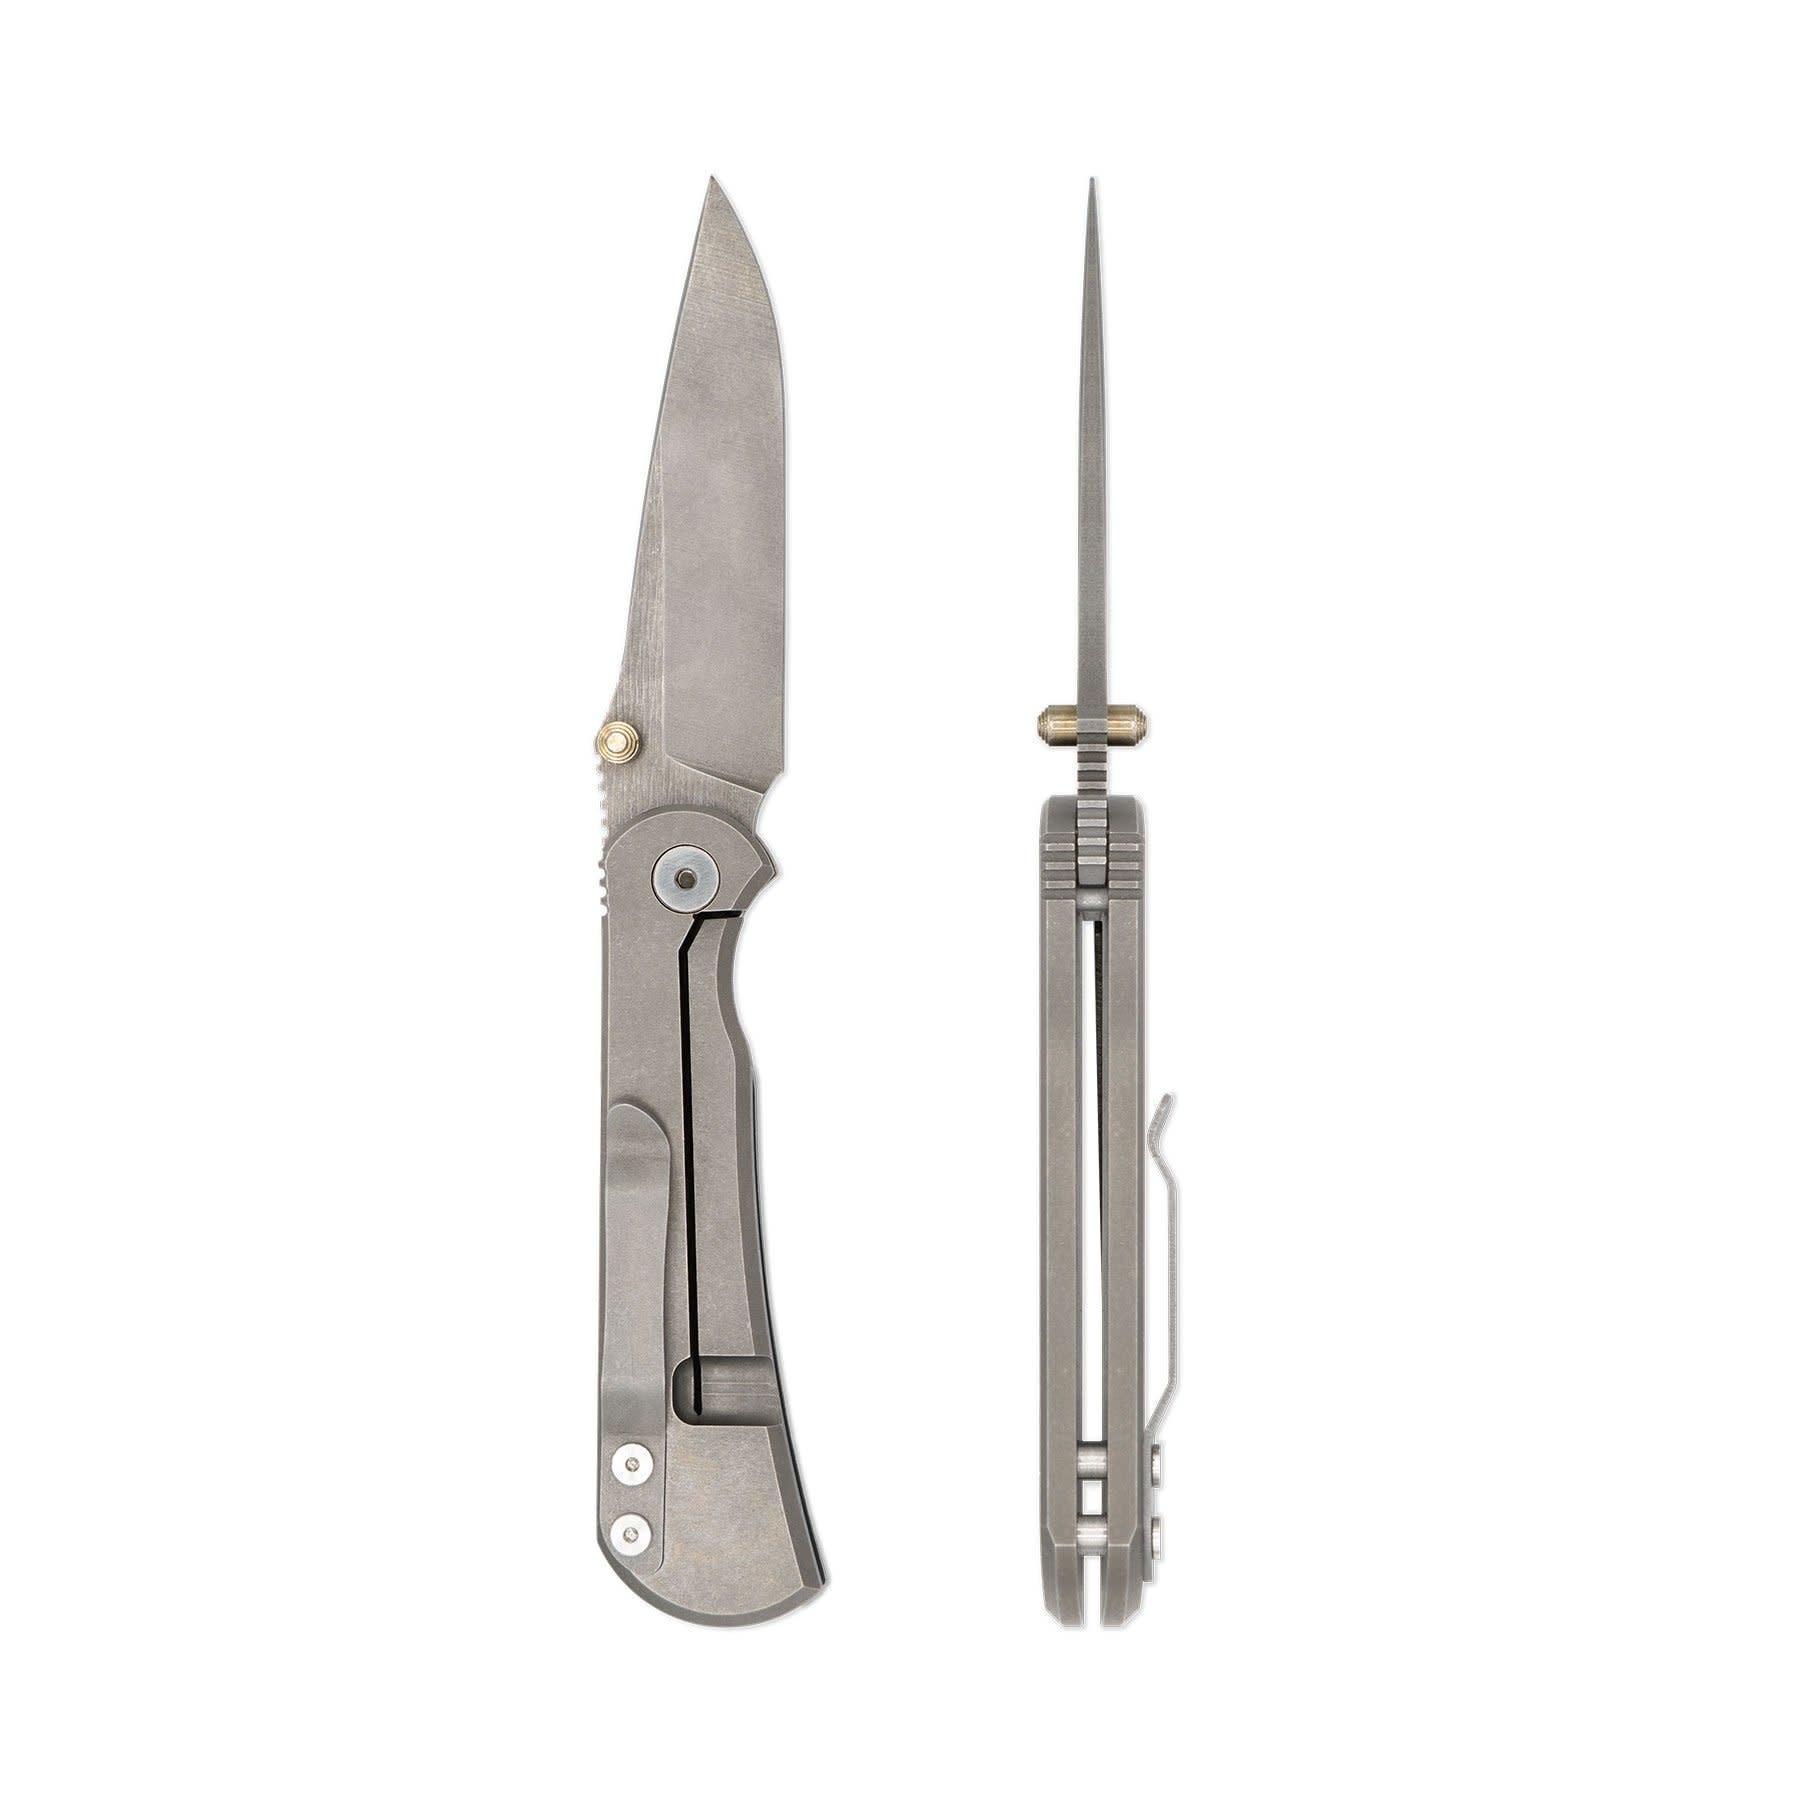 Toor Knives Merchant FL35S - Stone